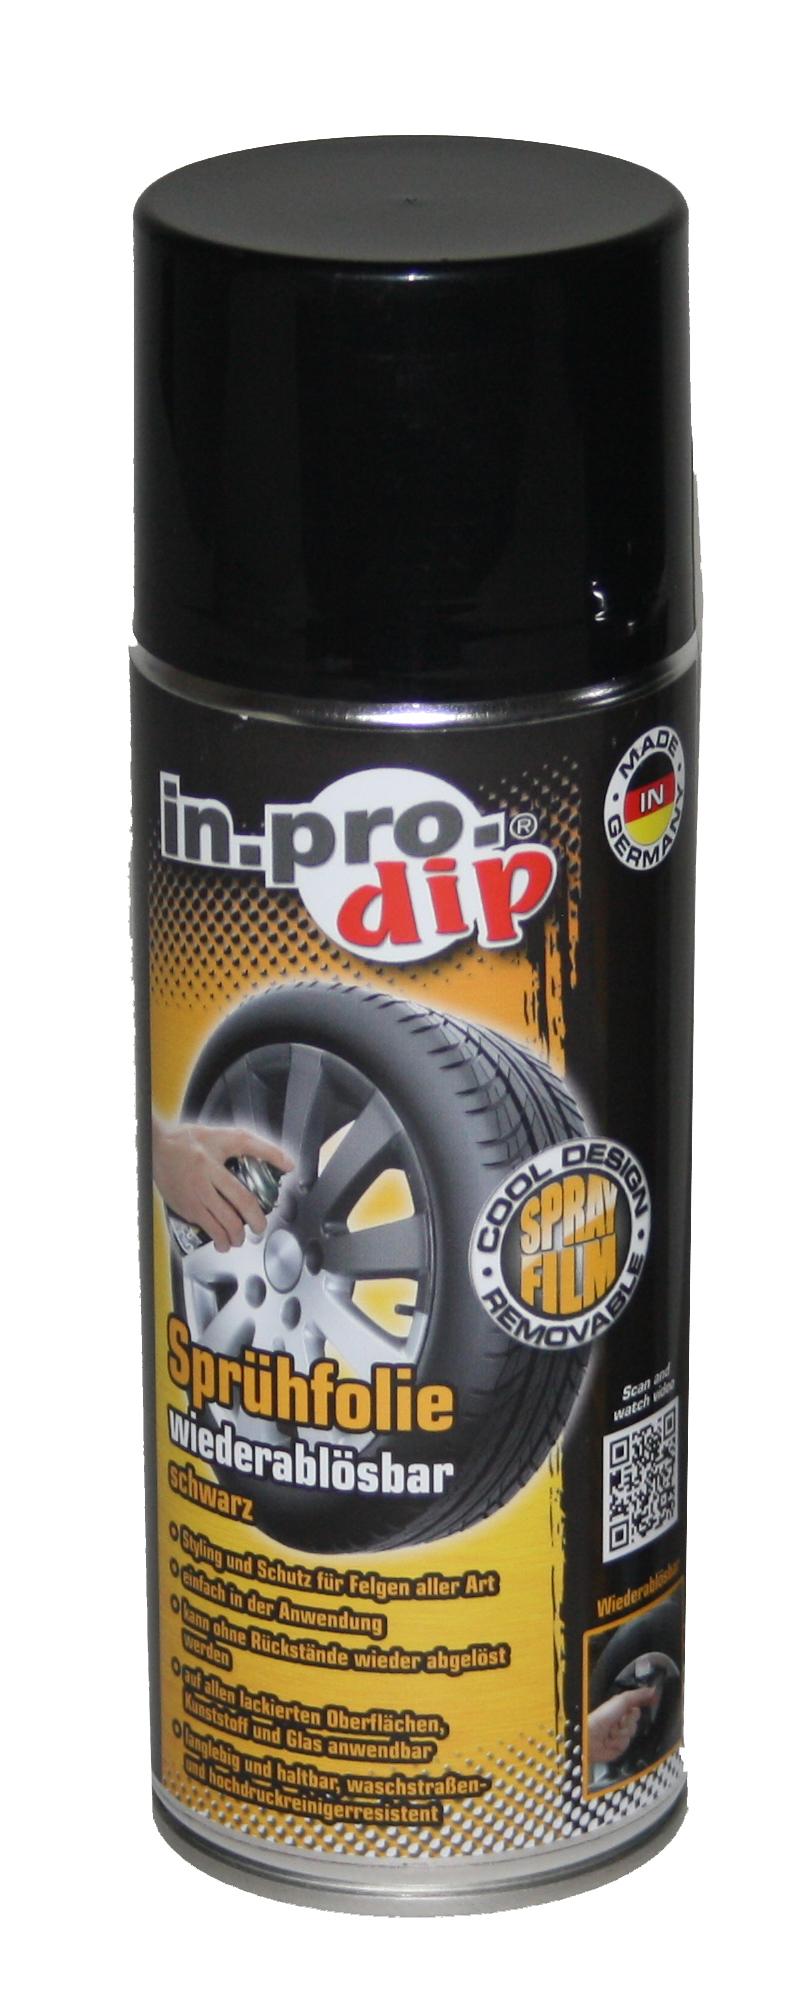 400ml Sprühfolie schwarz matt Felgenfolie Felgenspray IN.PRO.DIP  Felgenfarbe | dynamic-24.de